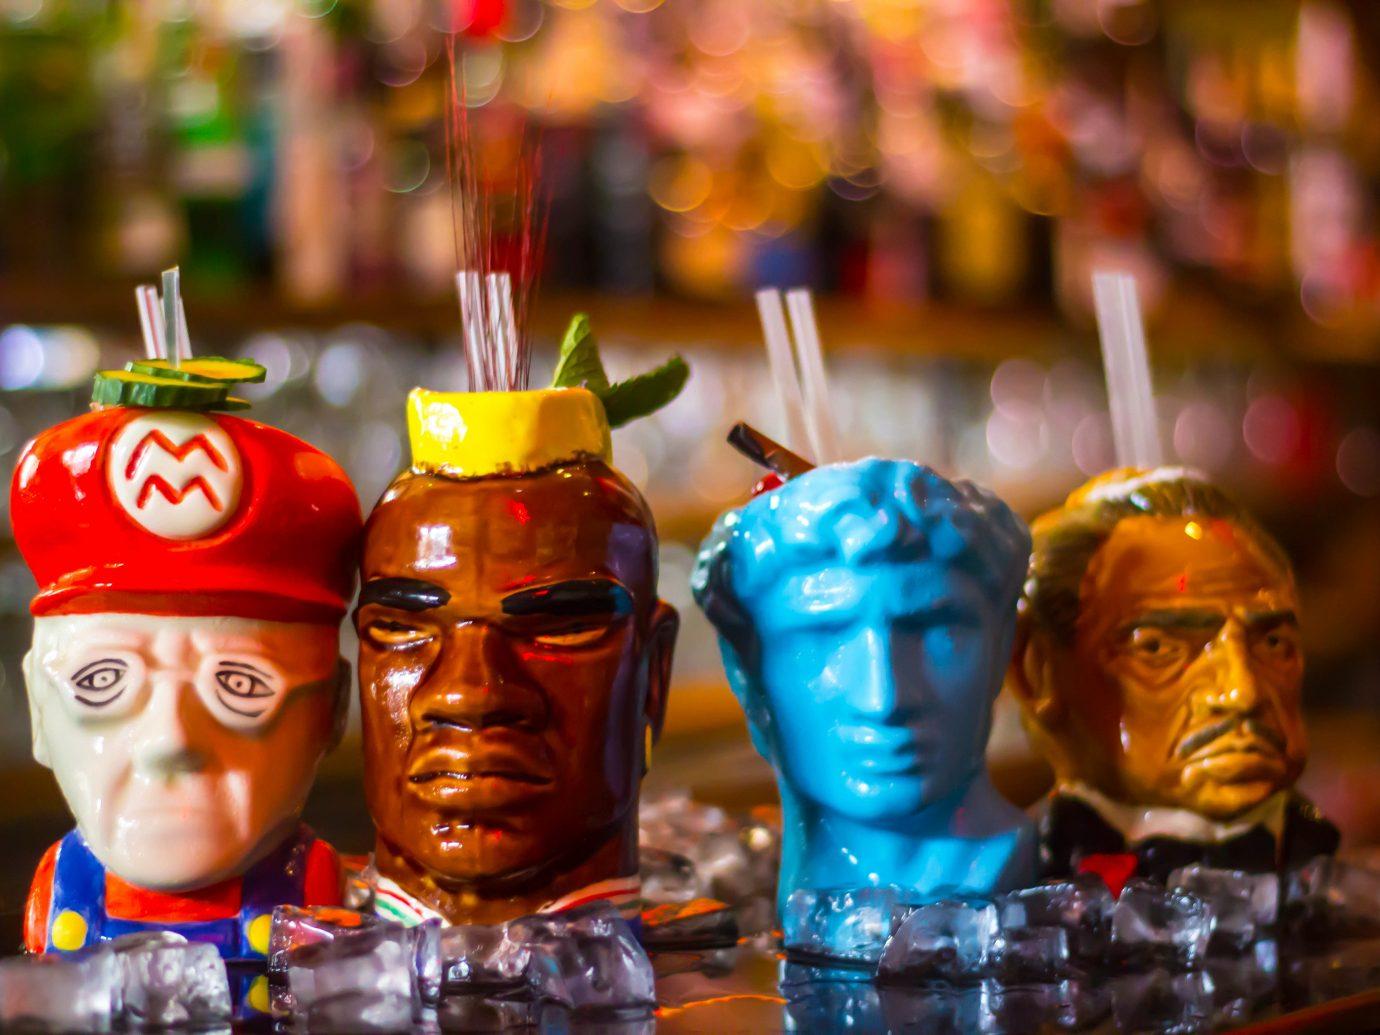 England europe London Luxury Travel Trip Ideas toy flavor Drink